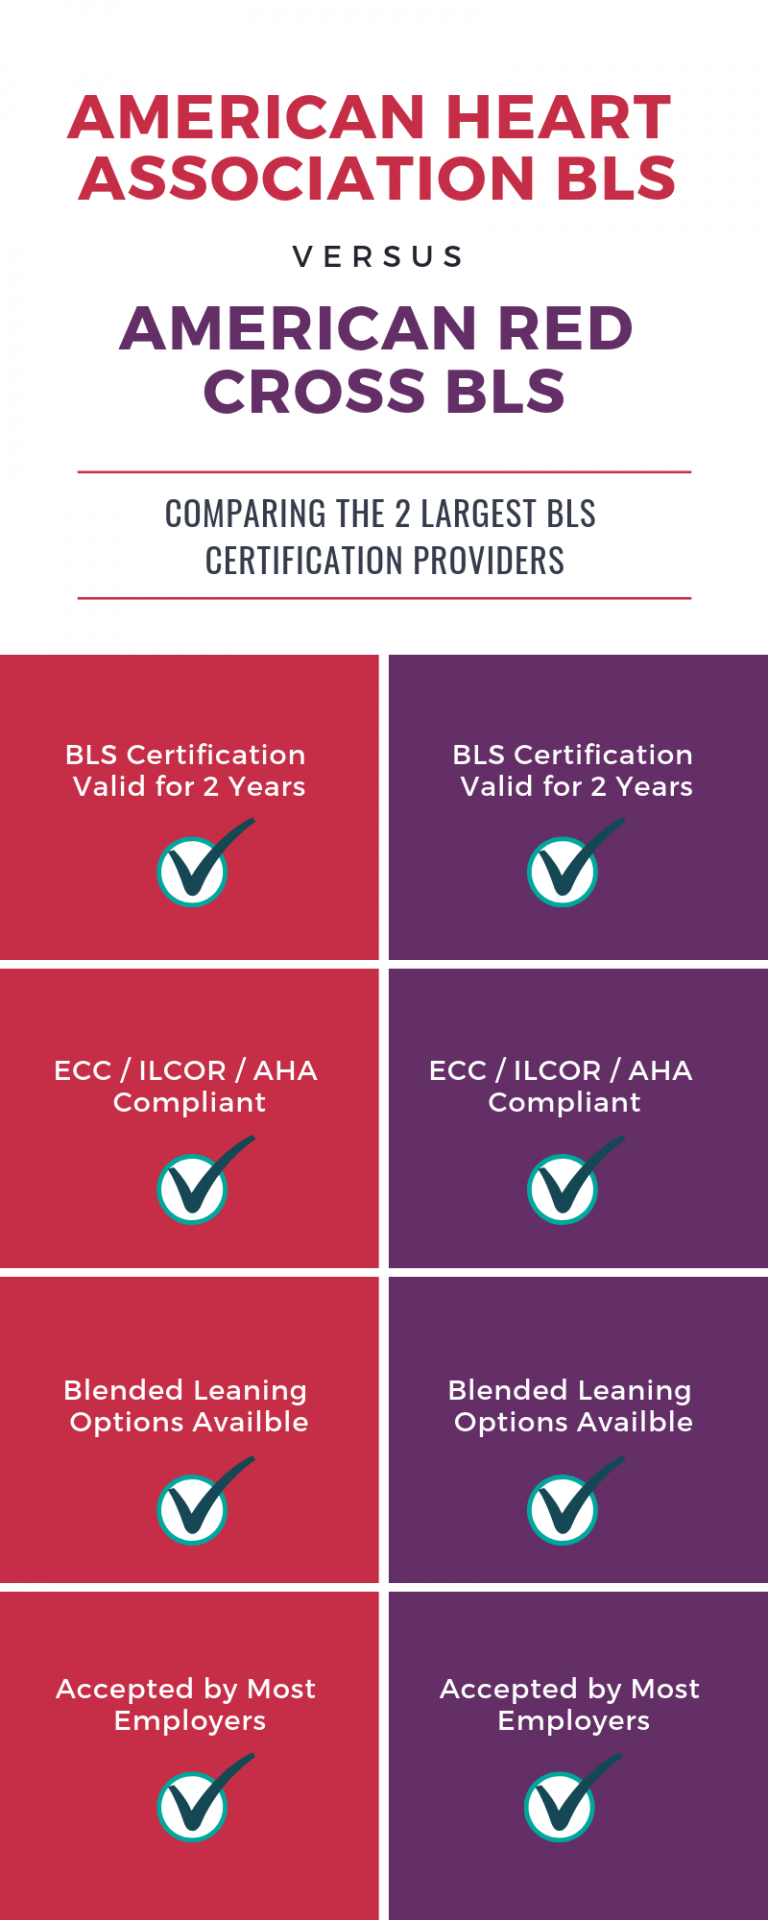 American Red Cross Vs American Heart Association Bls Certification